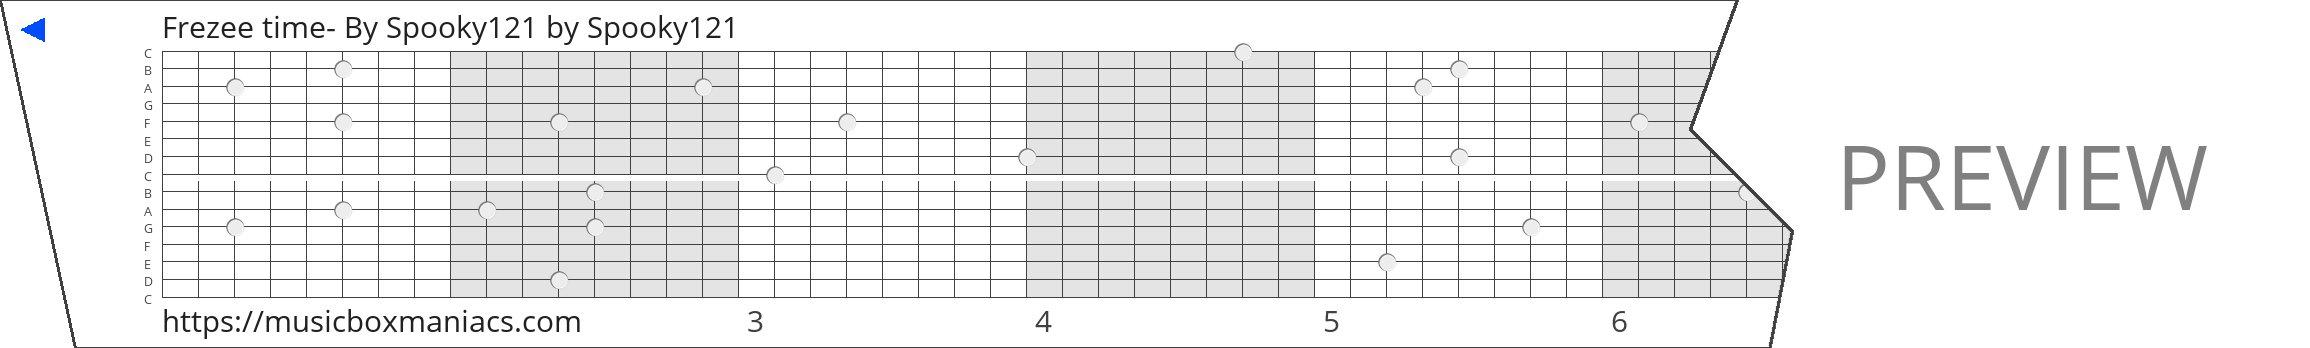 Frezee time- By Spooky121 15 note music box paper strip